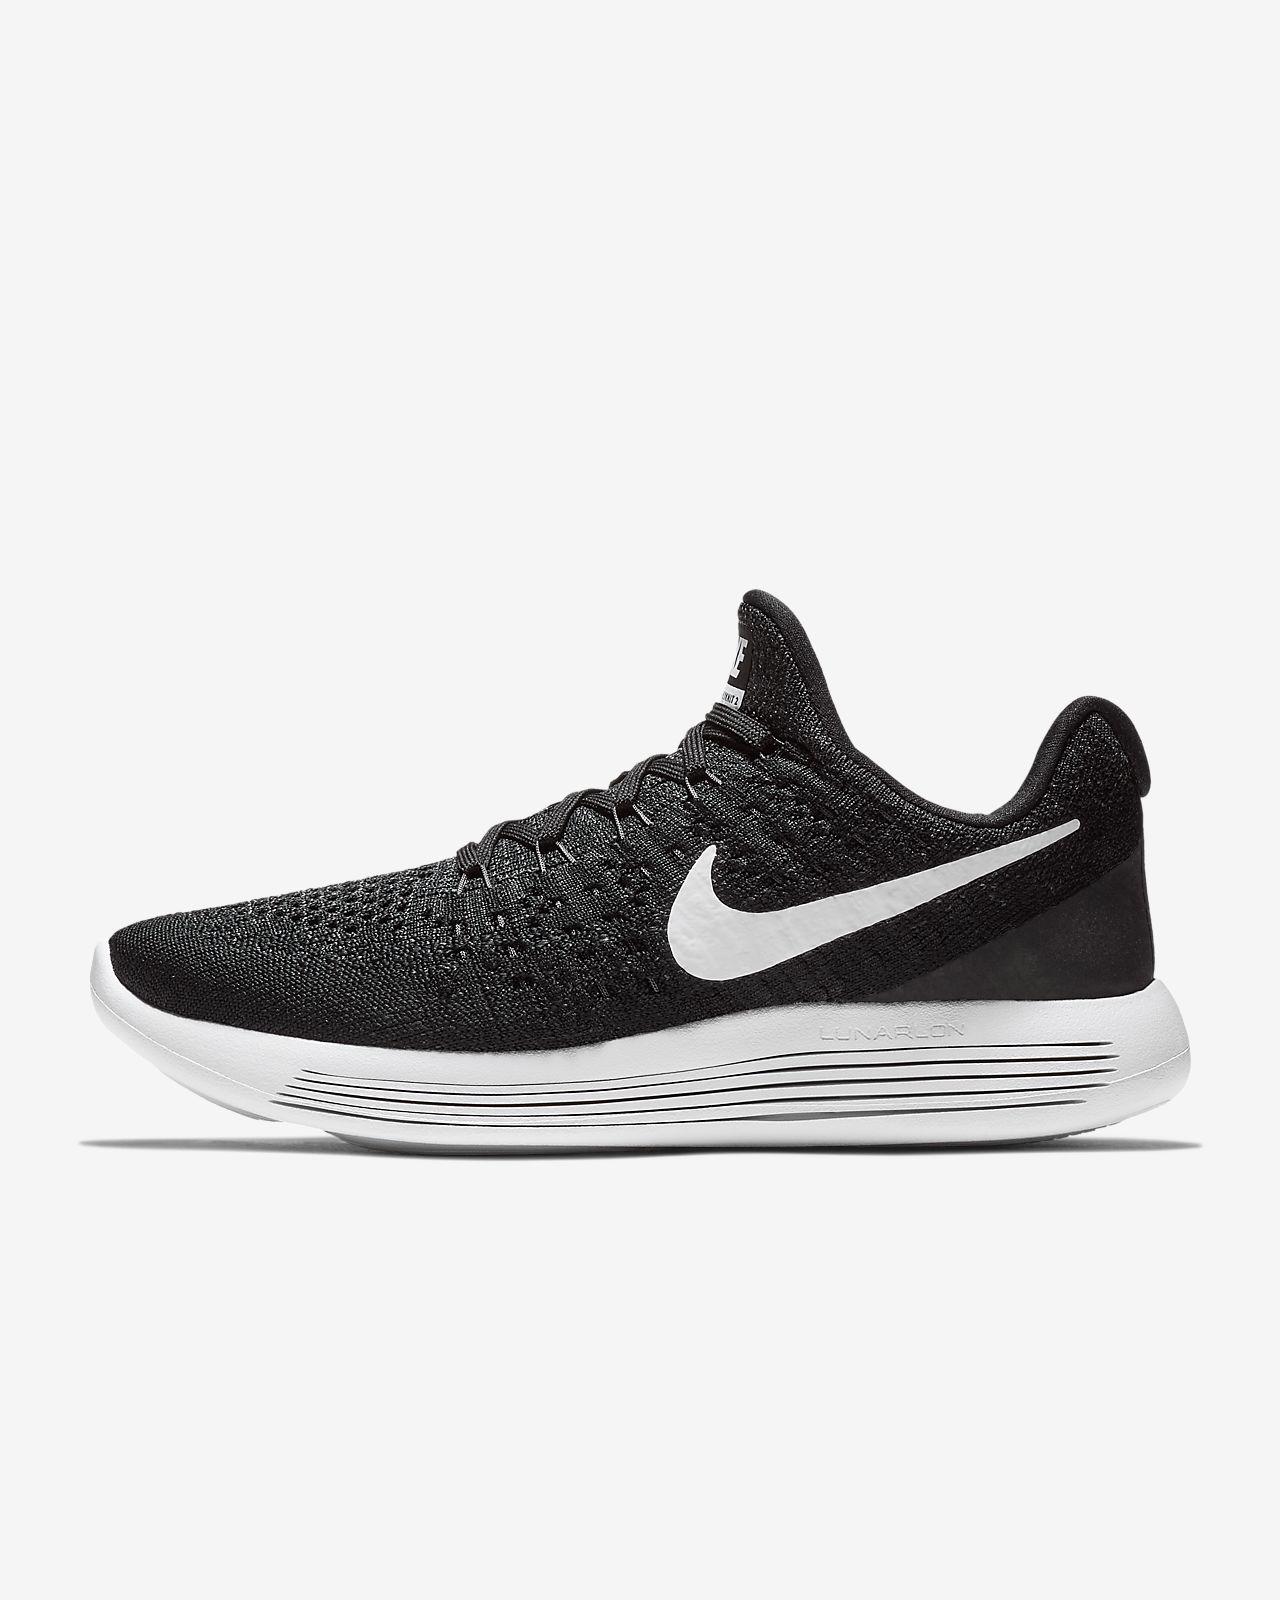 Calzado de running para mujer MX Nike LunarEpic Low Flyknit MX mujer 77cee0